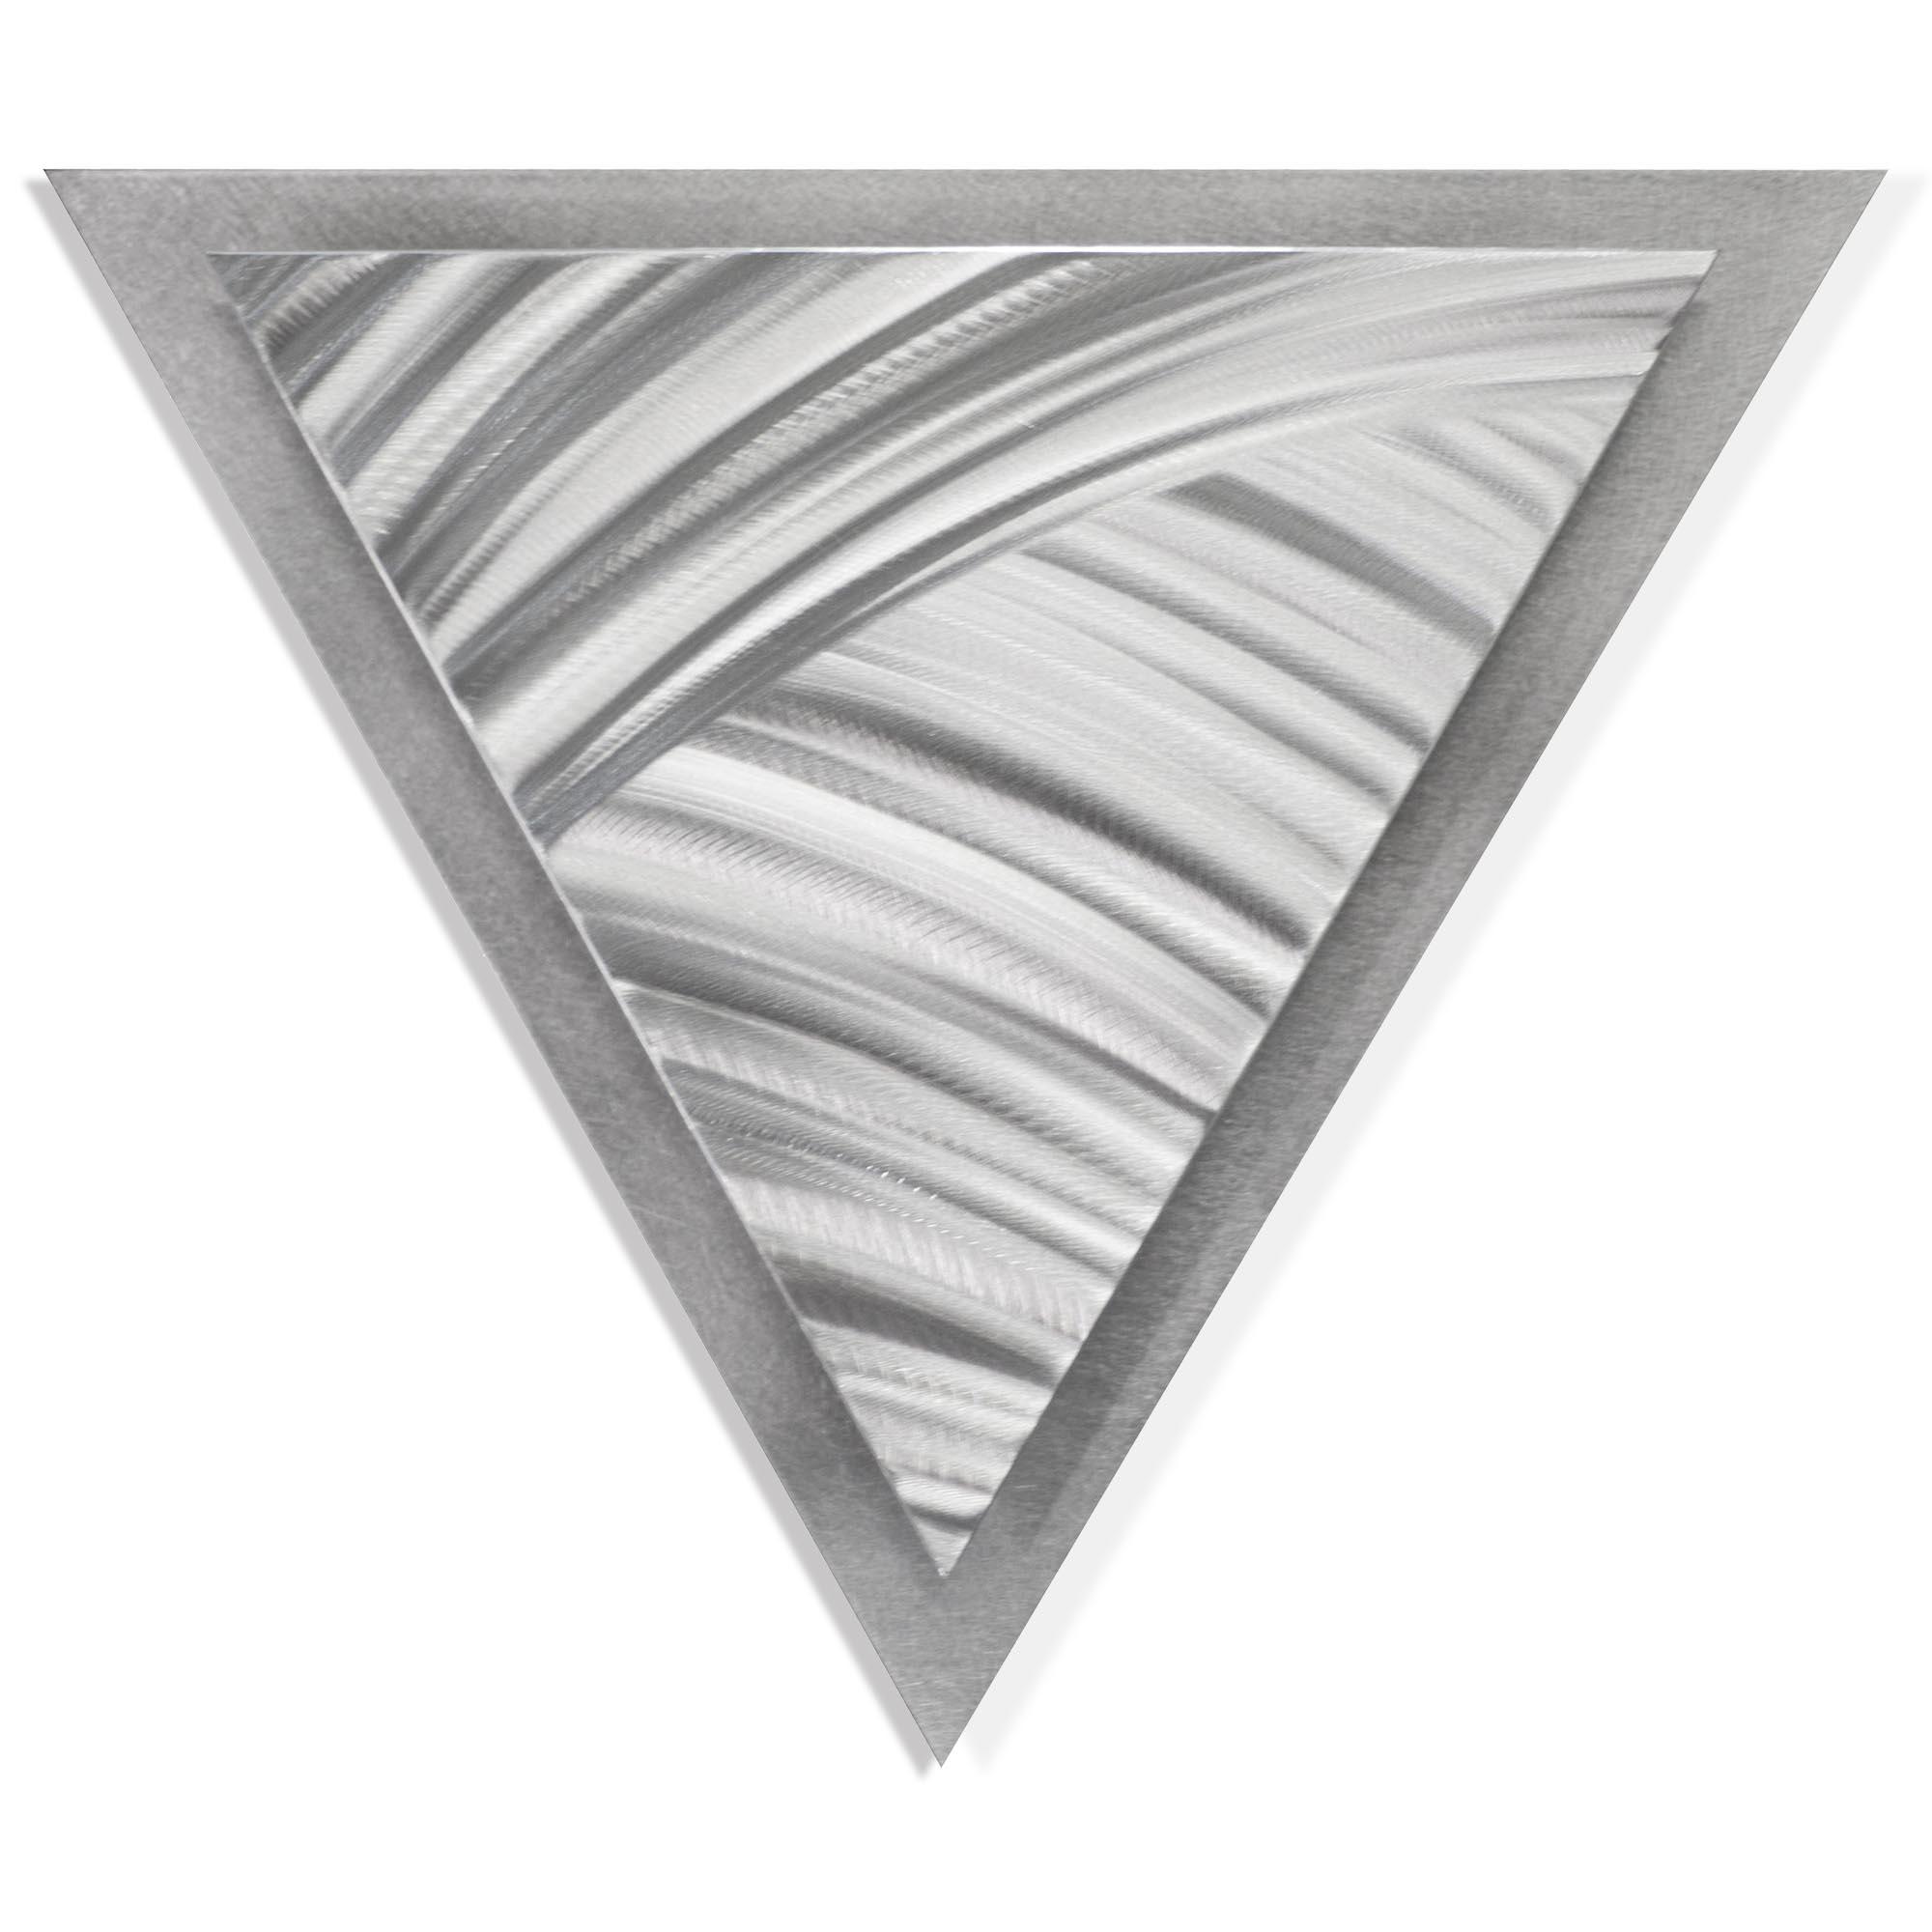 Helena Martin 'Folded Angle' 15in x 13in Modern Metal Art on Ground Metal